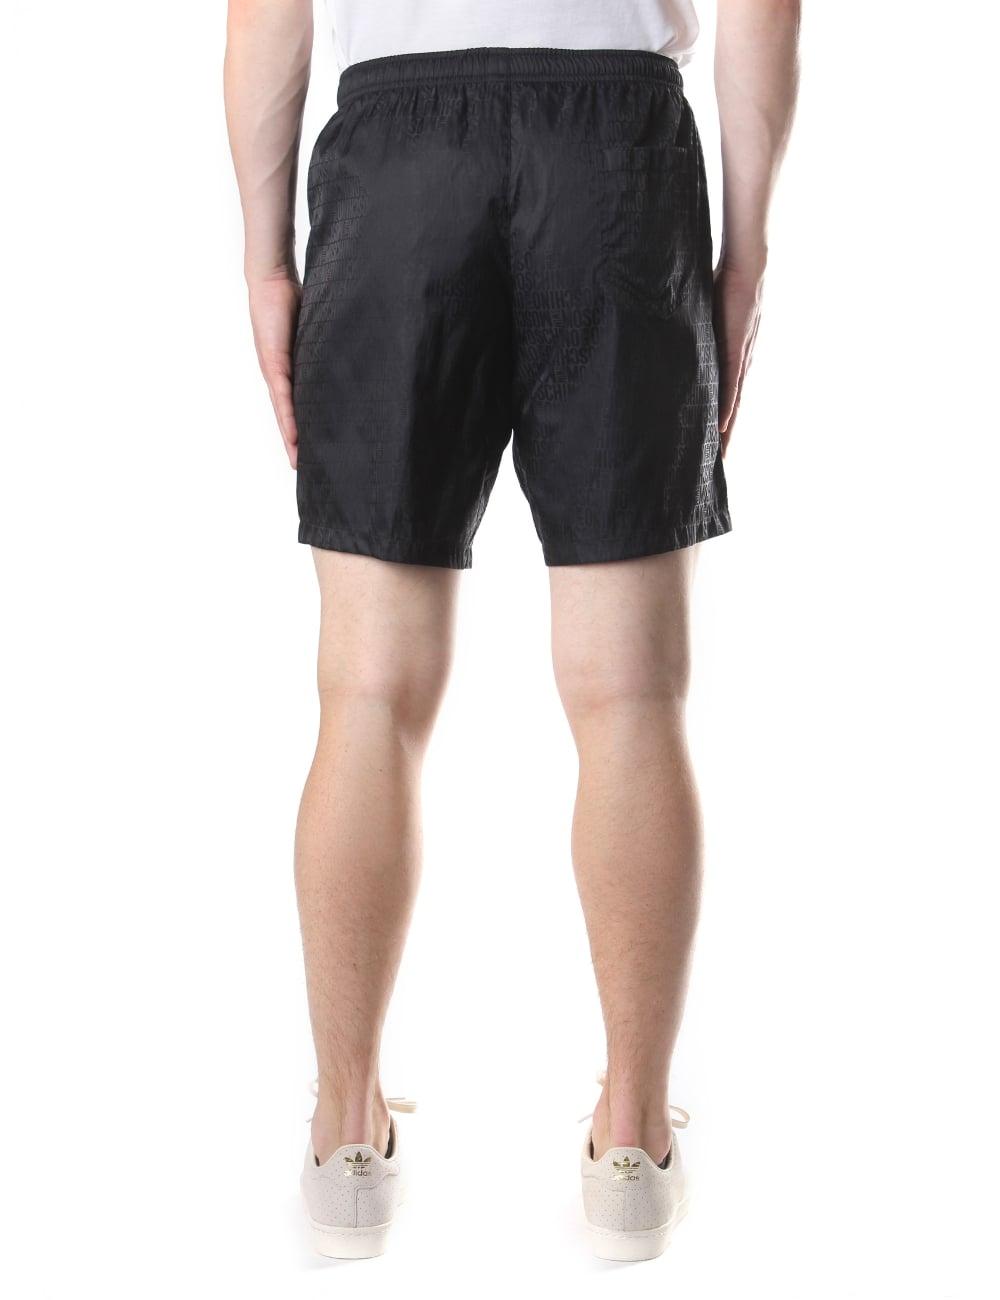 6b7ed77175a97 Moschino Repeat Logo Men's Swim Shorts